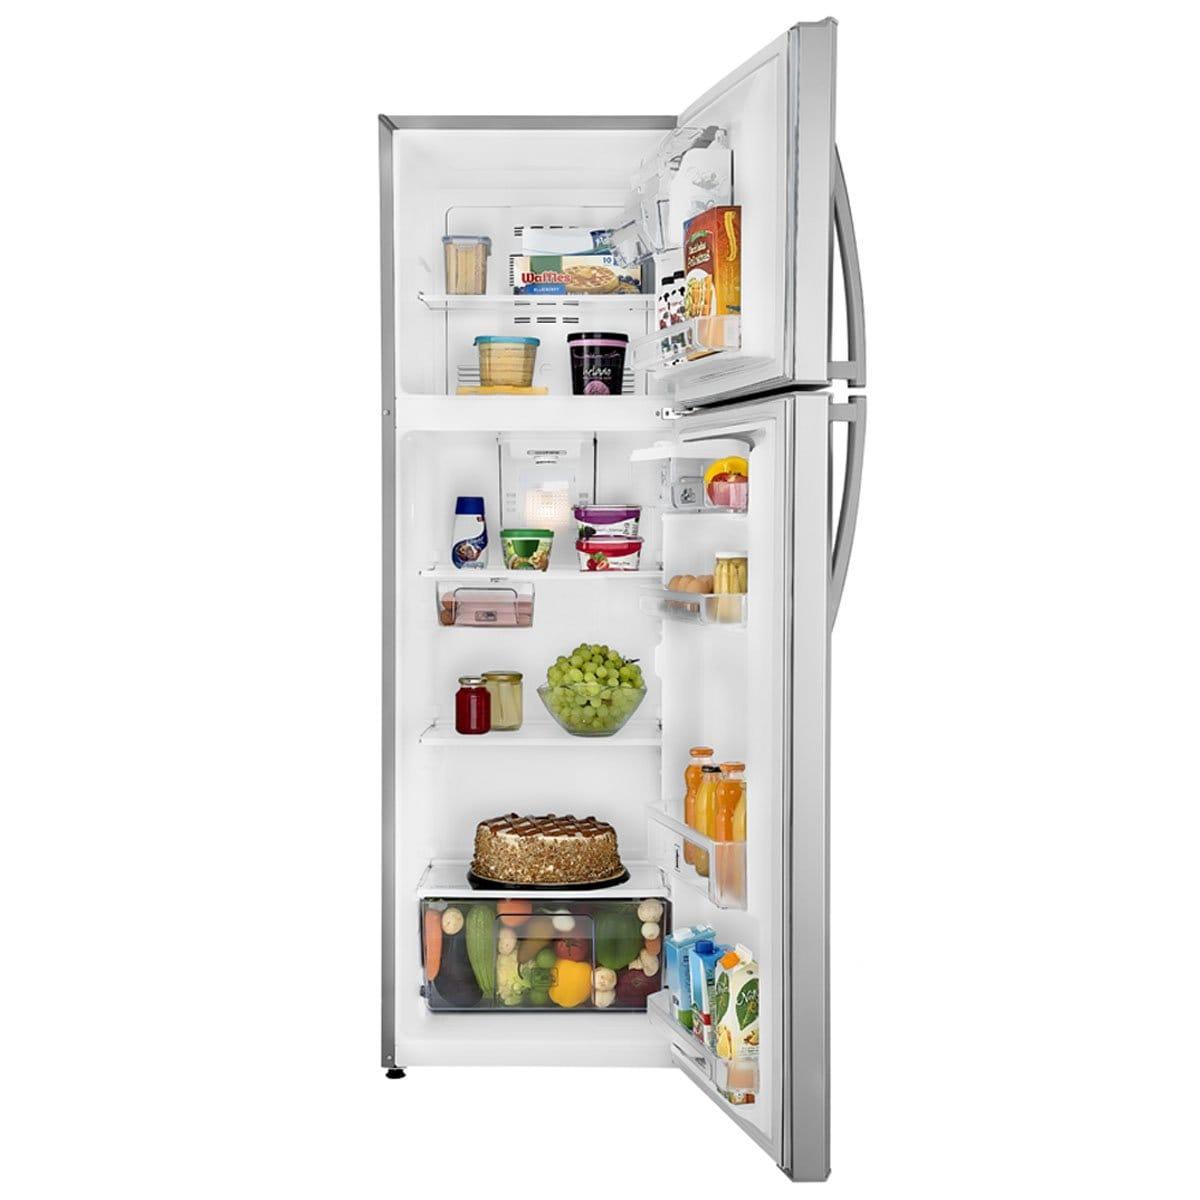 Refrigerador Mabe 2 Puertas 11Pies Rma1130Ymfe0 Grafito